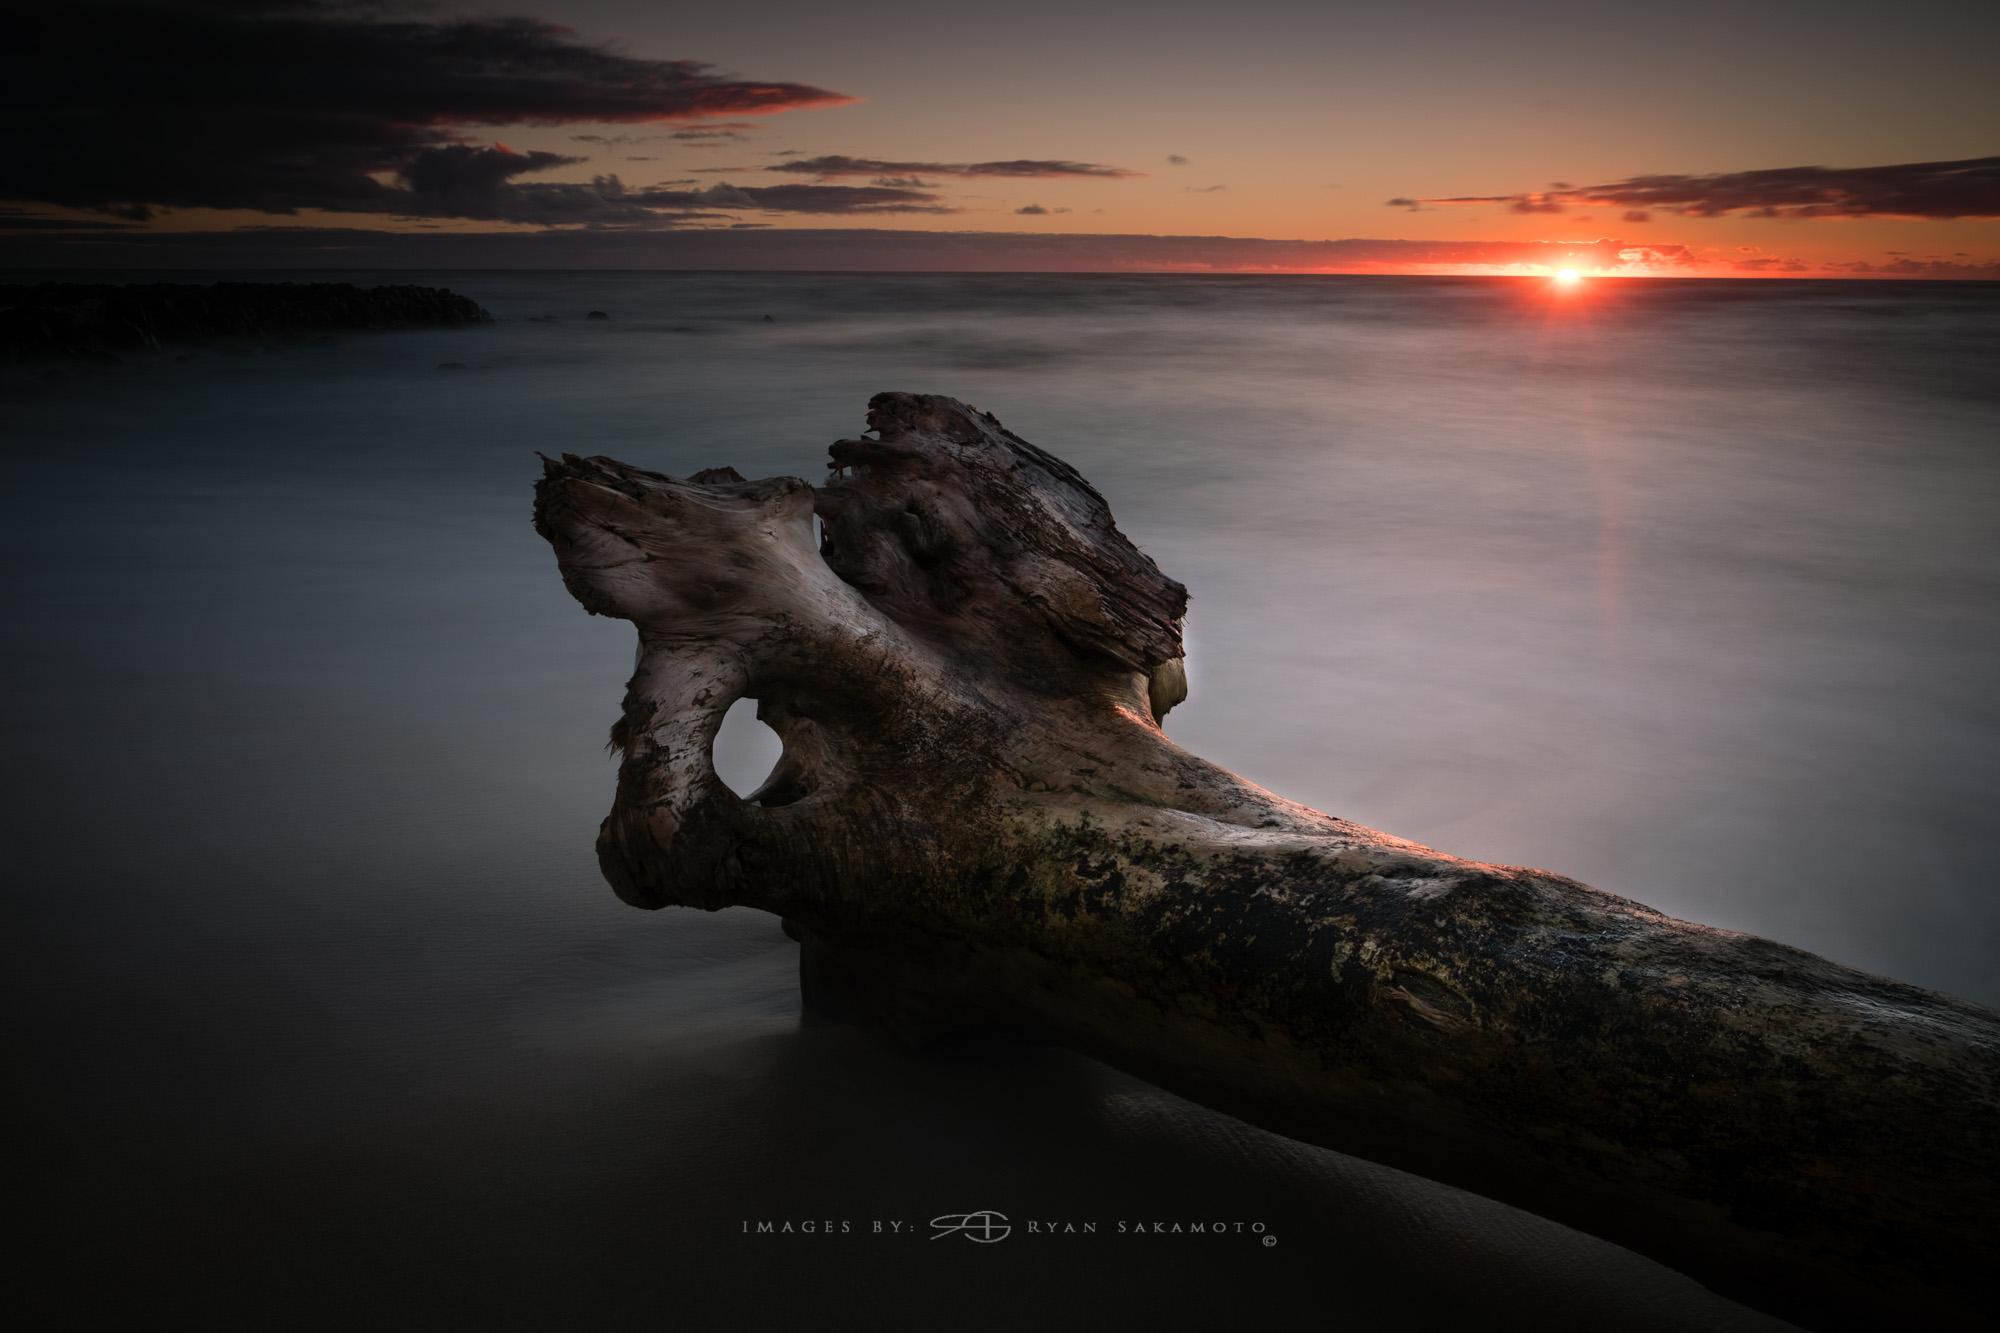 Kauai Driftwood Sunrise    Lee Filter Big Stopper & 3 stop medium grad   Fuji XPro 2  |  30 sec. |  f/8|  ISO 200  |    XF16mm f/1.4 R WR   Edited in Lightroom & Photoshop CC 2015   Copyright 2016 Ryan Sakamoto, All rights reserved